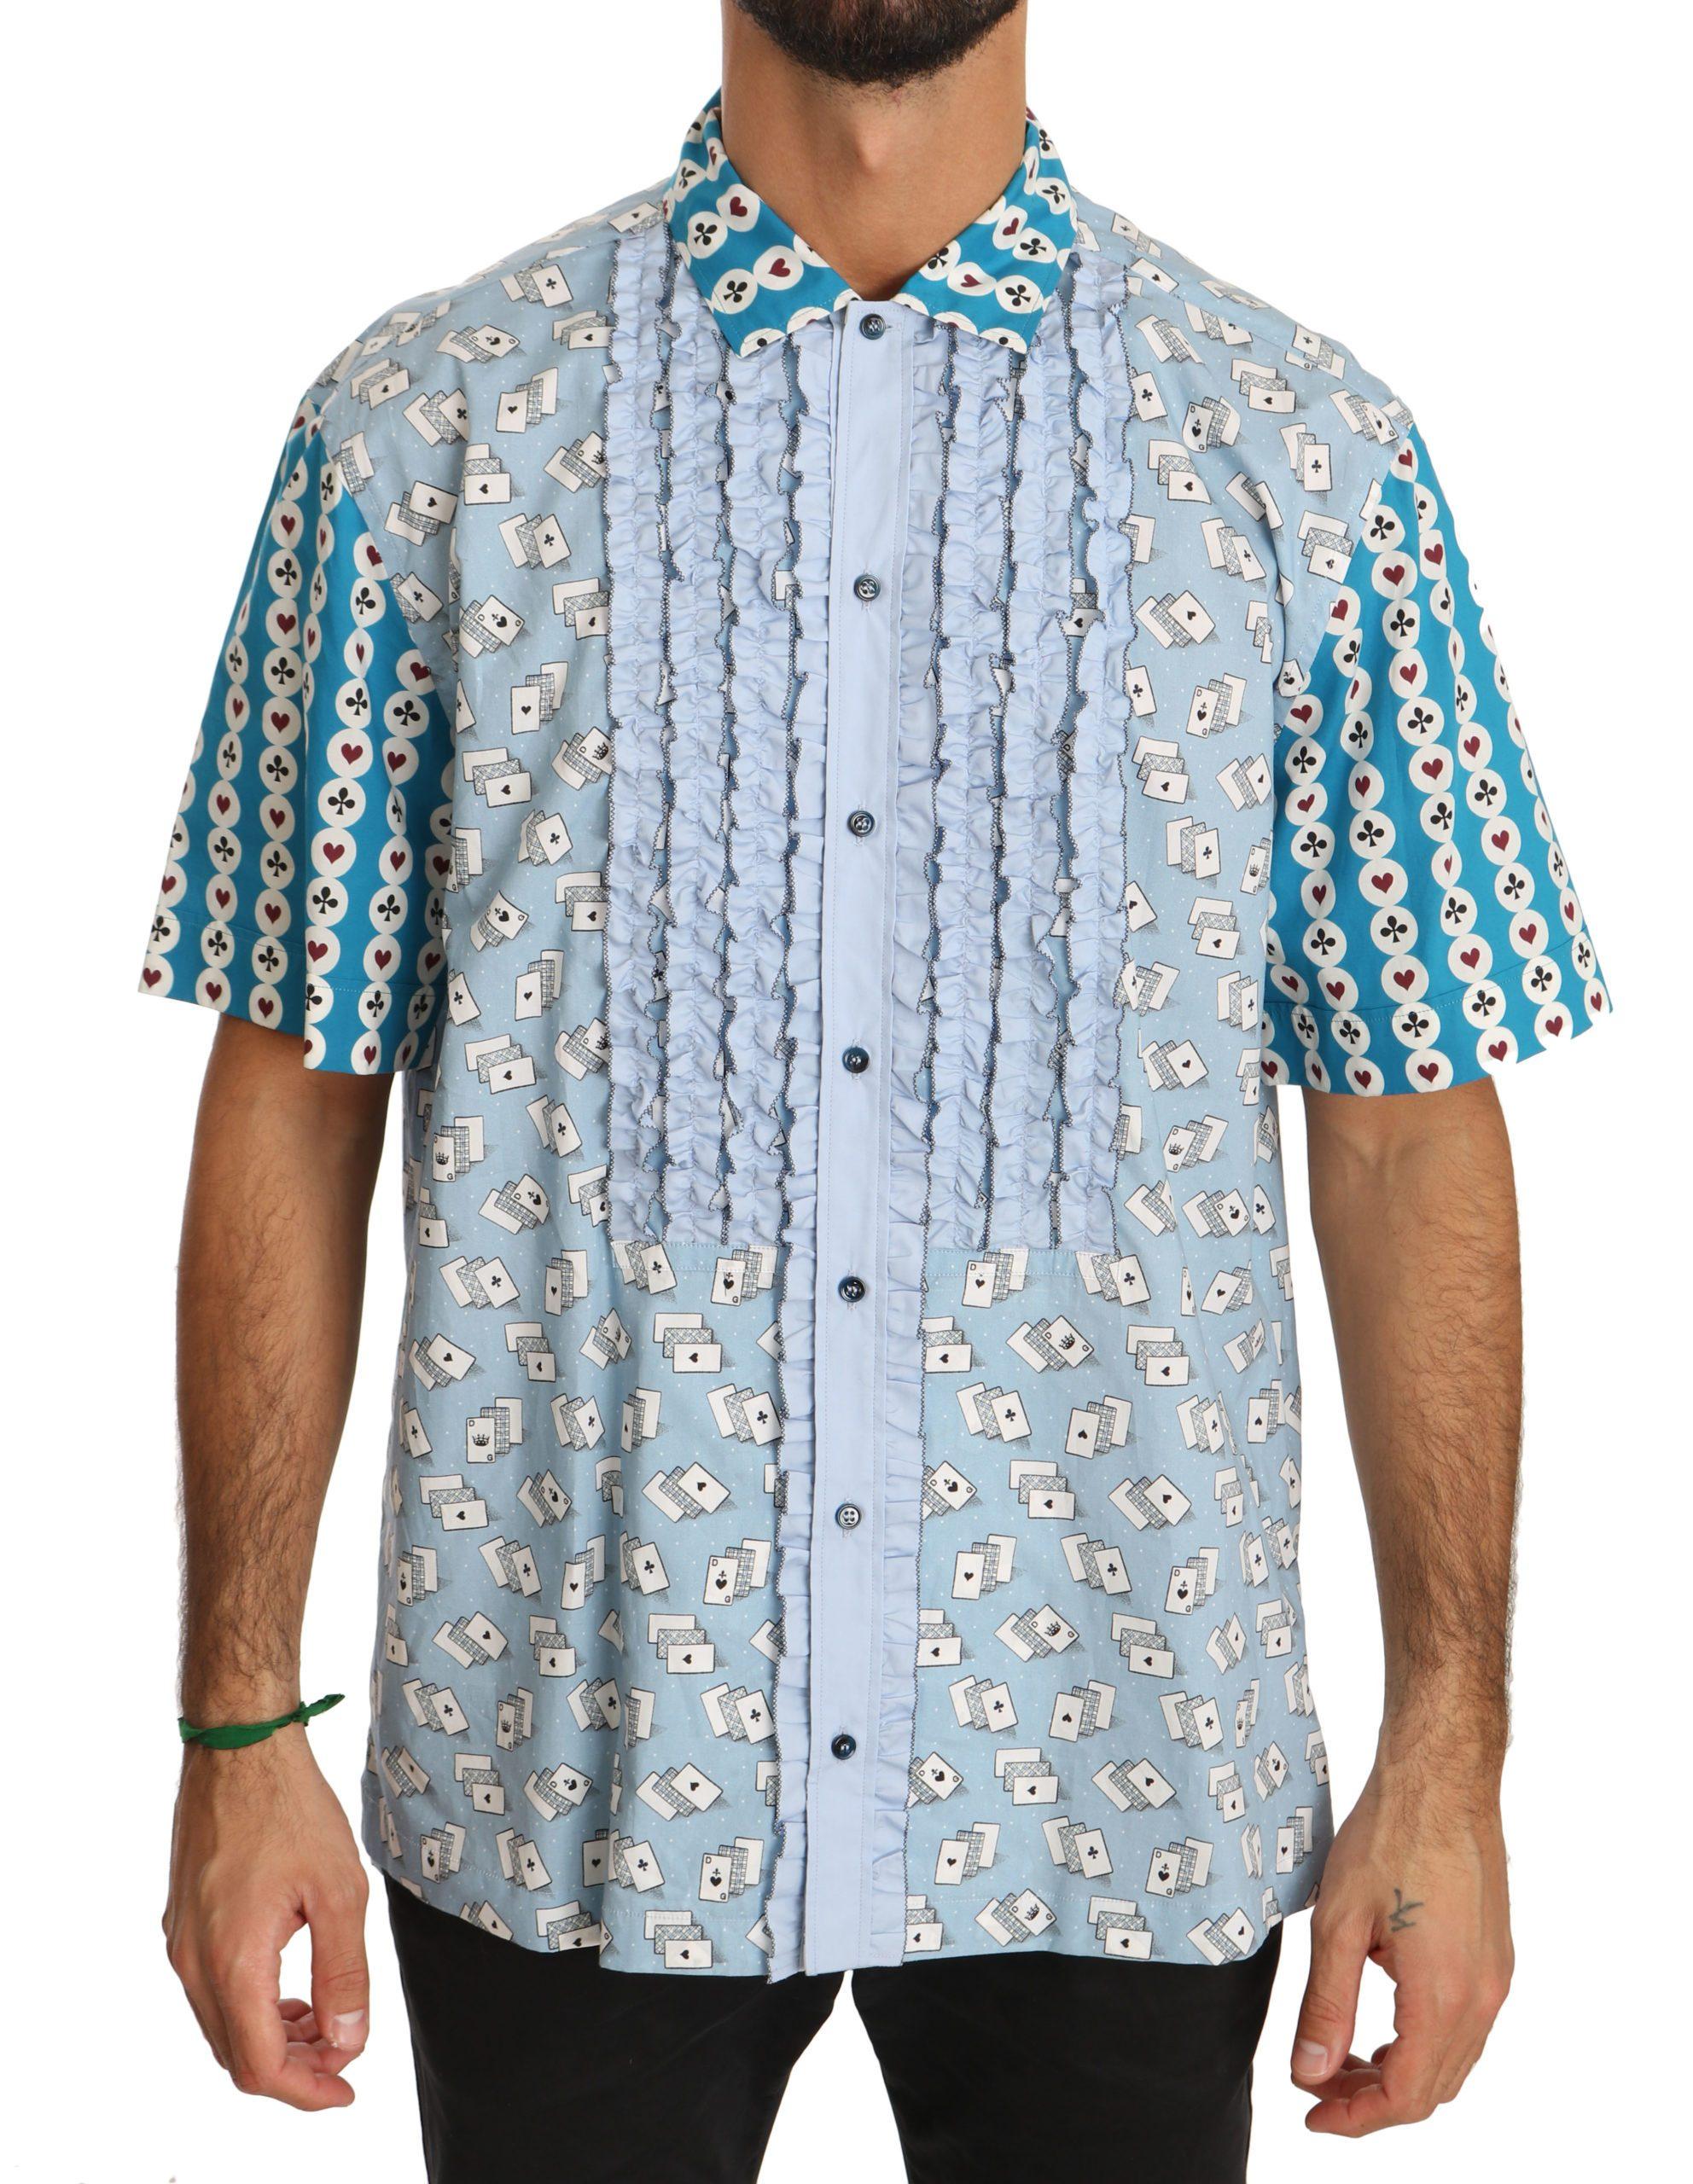 Dolce & Gabbana Men's Deck Of Card Formal Cotton Dress Shirt Blue TSH3903 - IT40   M